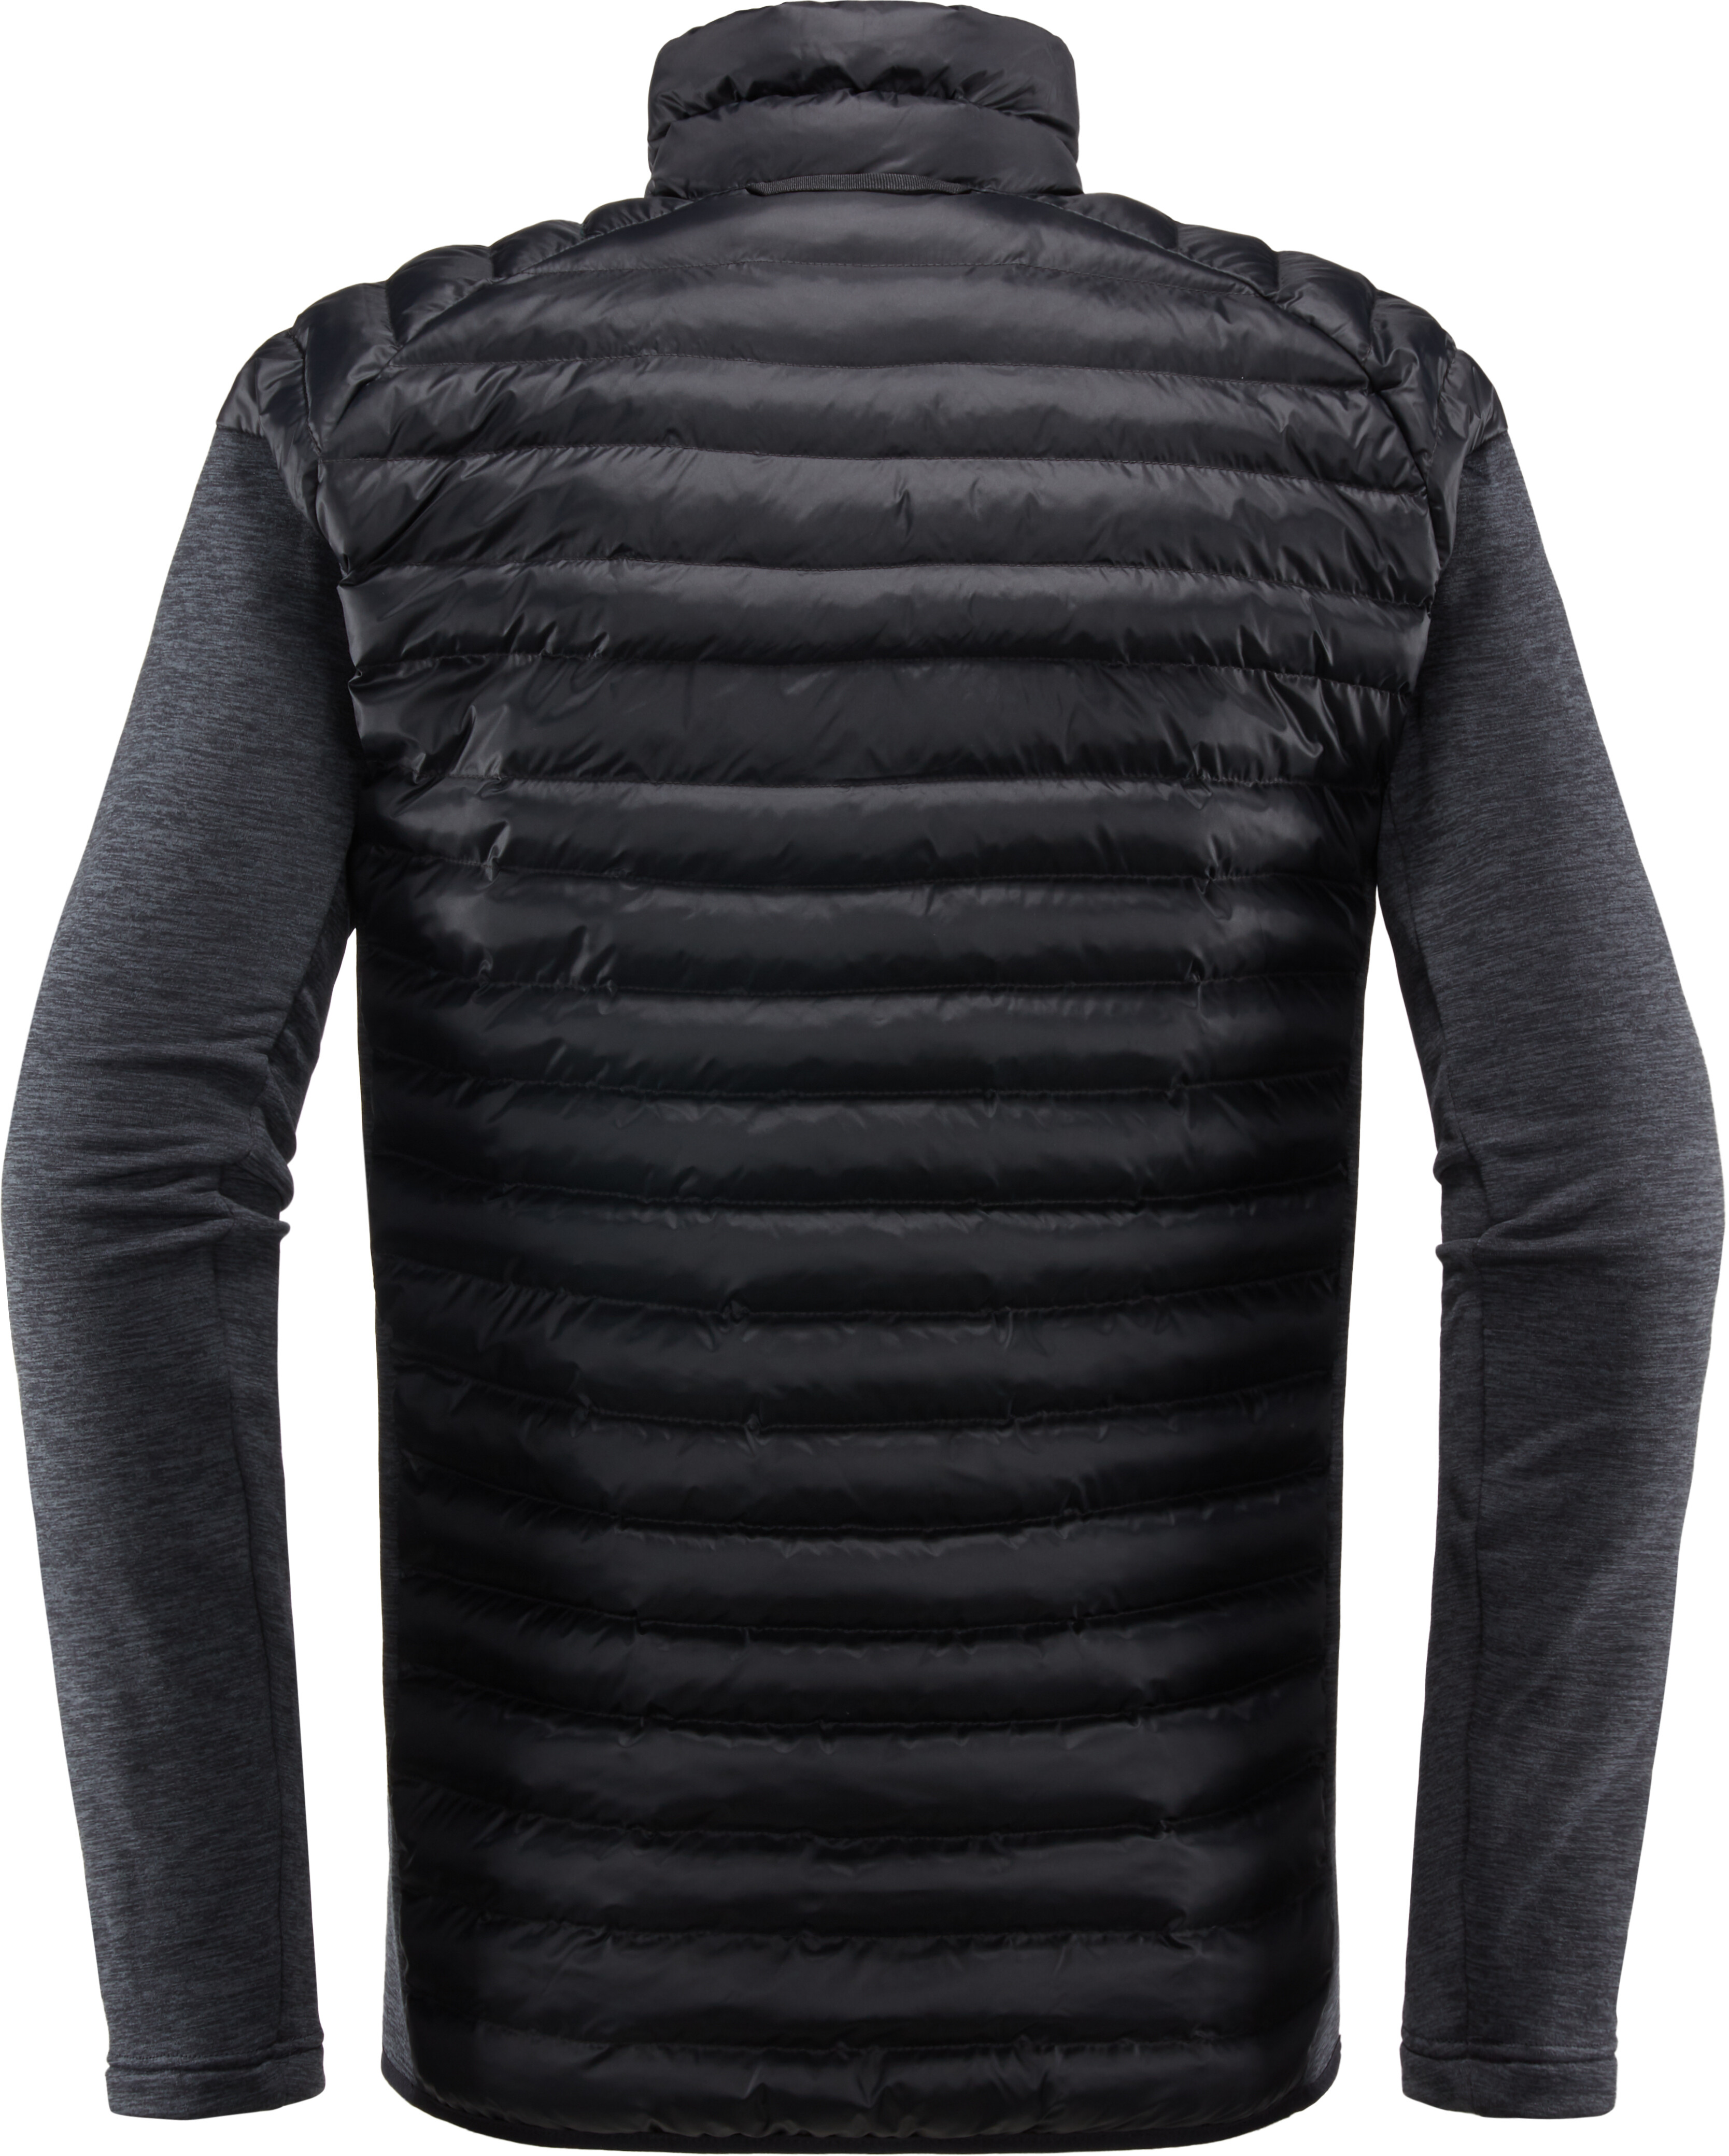 famous brand arriving fashion Haglöfs Mimic Veste hybride Homme, true black